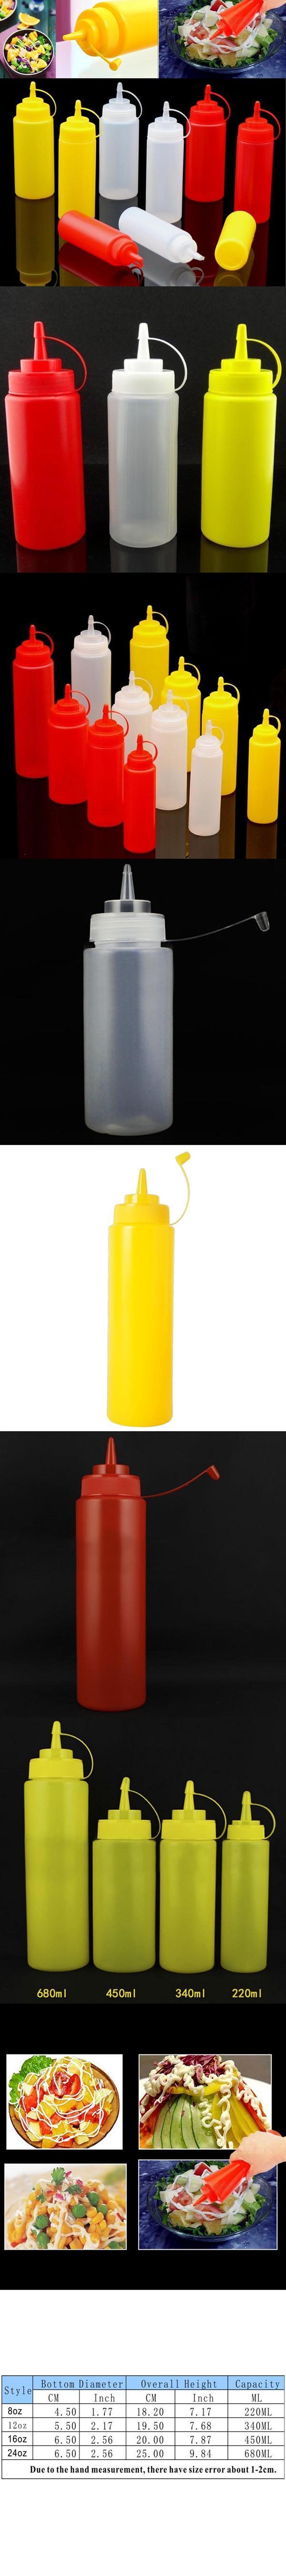 24//16//8oz Klar Kunststoff Squeeze Flasche Gewürzspender-Ketchup Senf-Sauce Essig